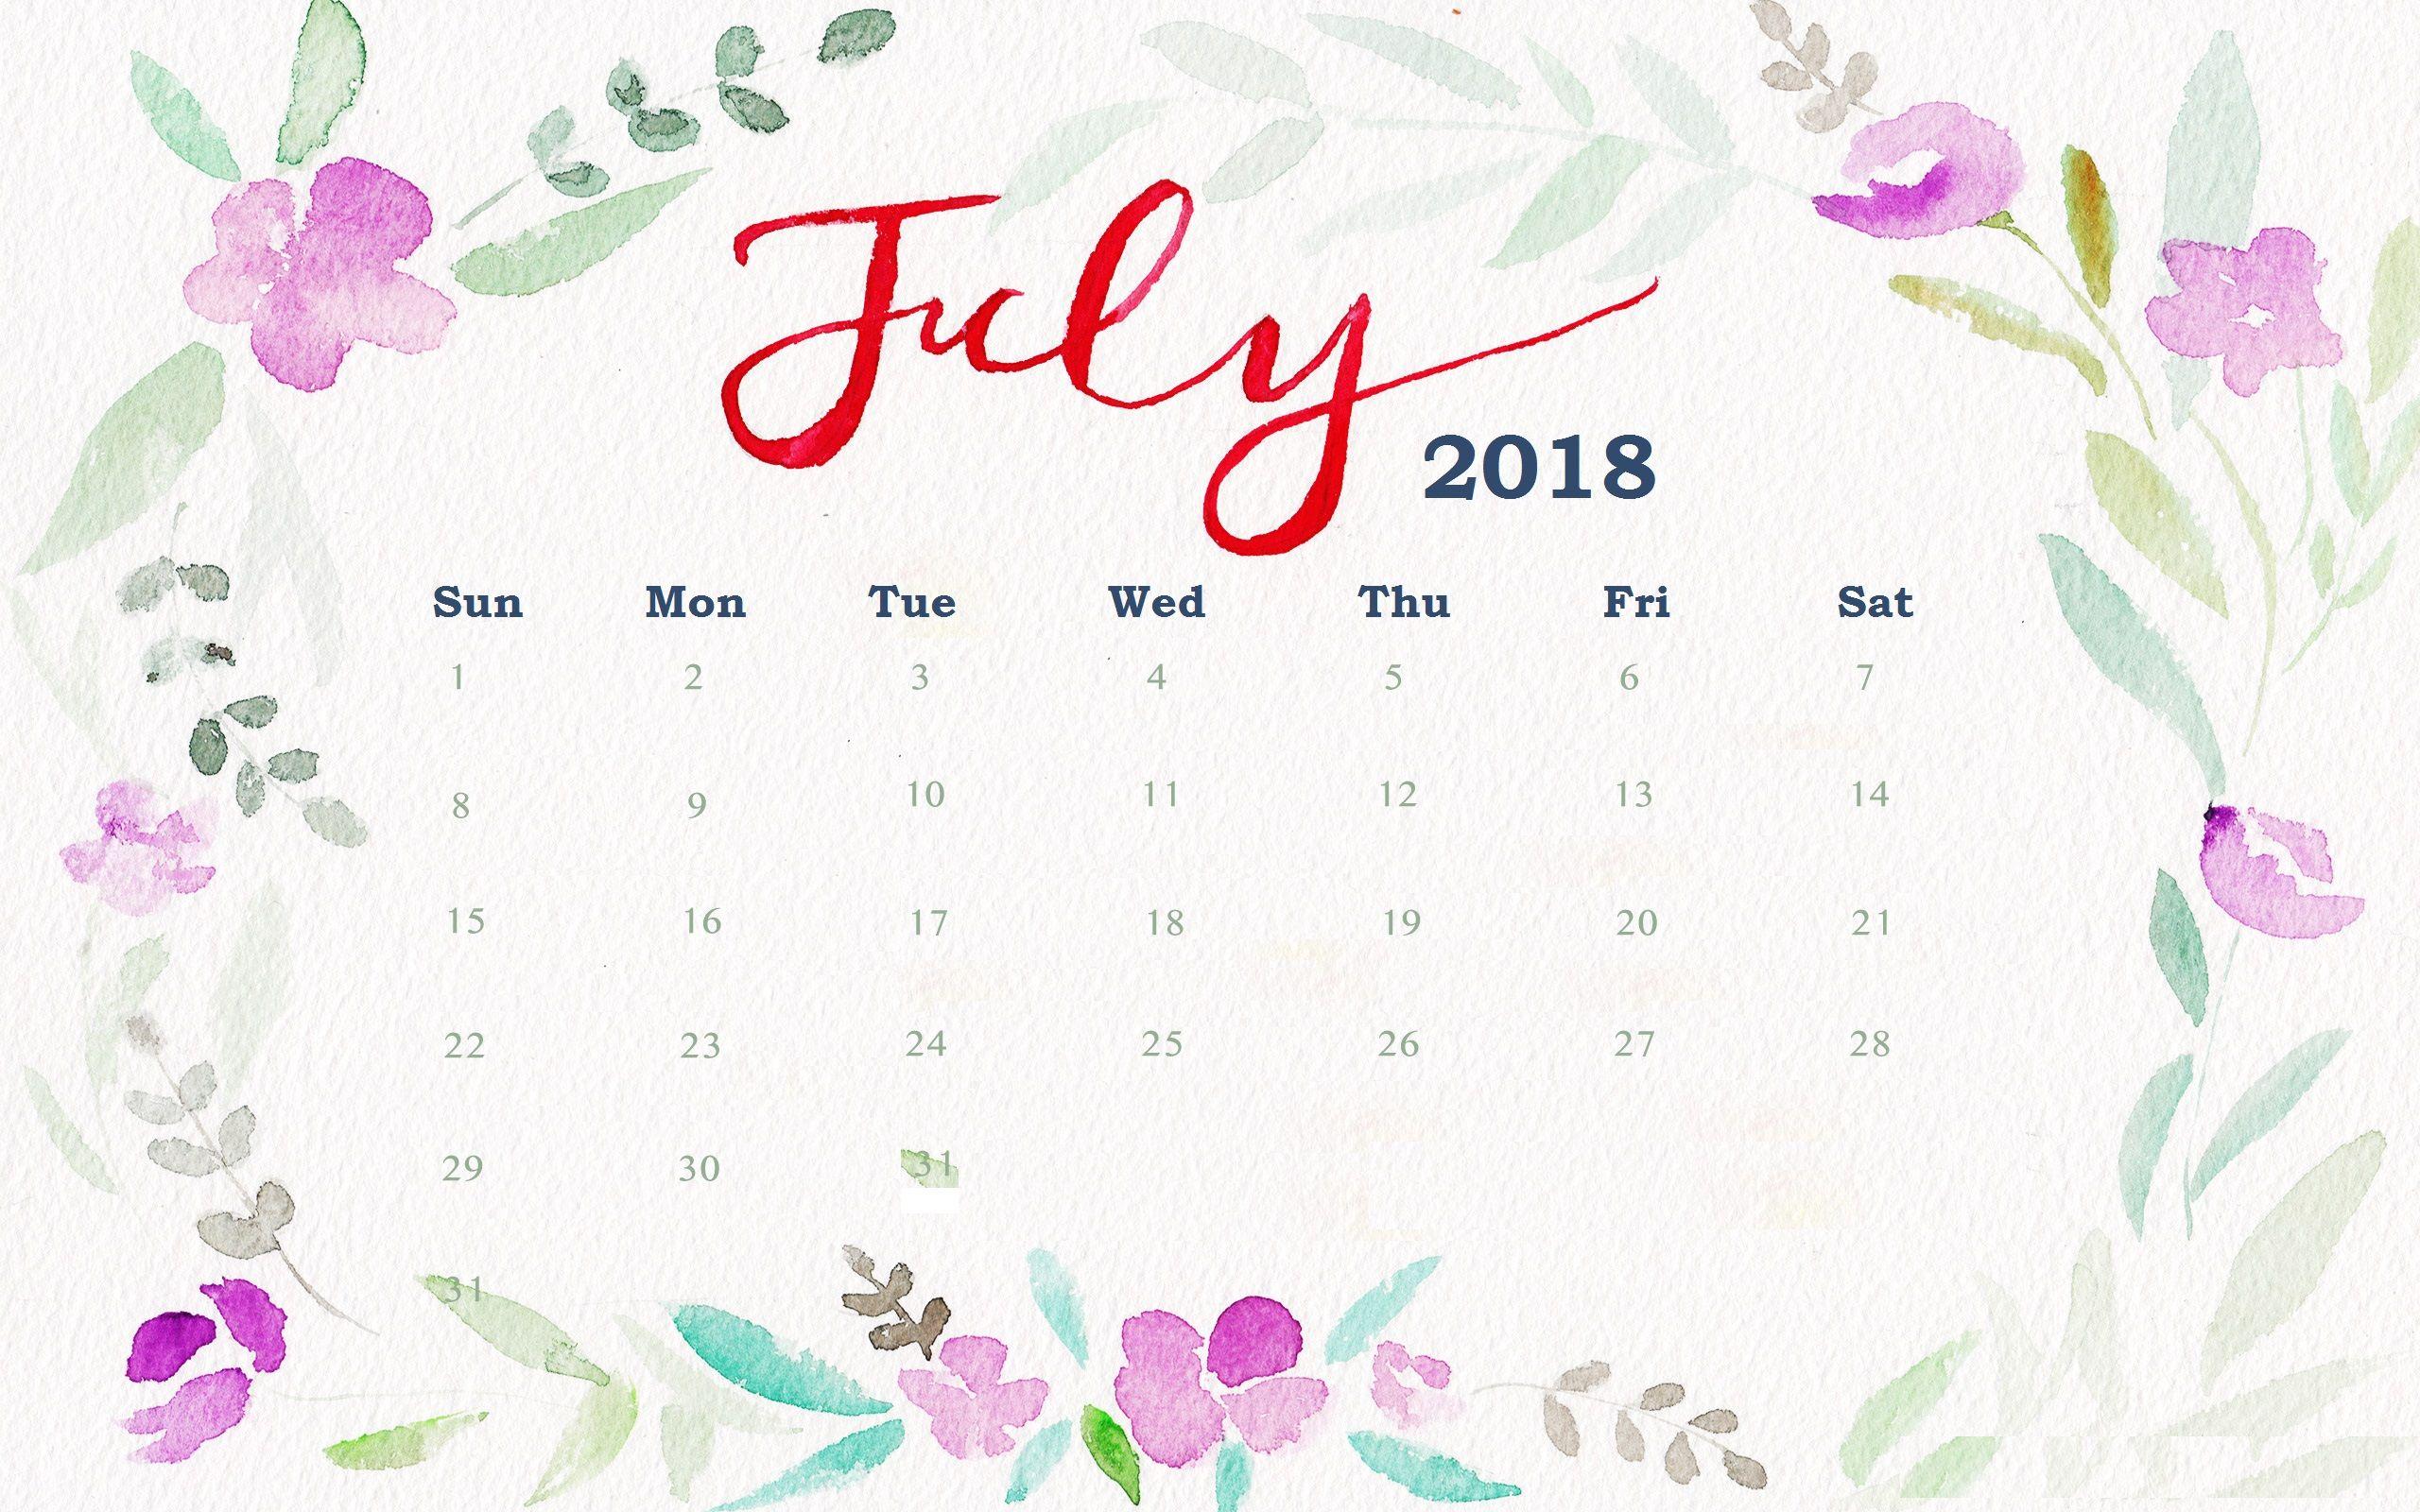 July 2018 Floral Desktop Calendar   Maxcalendars In 2019   Desktop in July Calendar Template Flowers